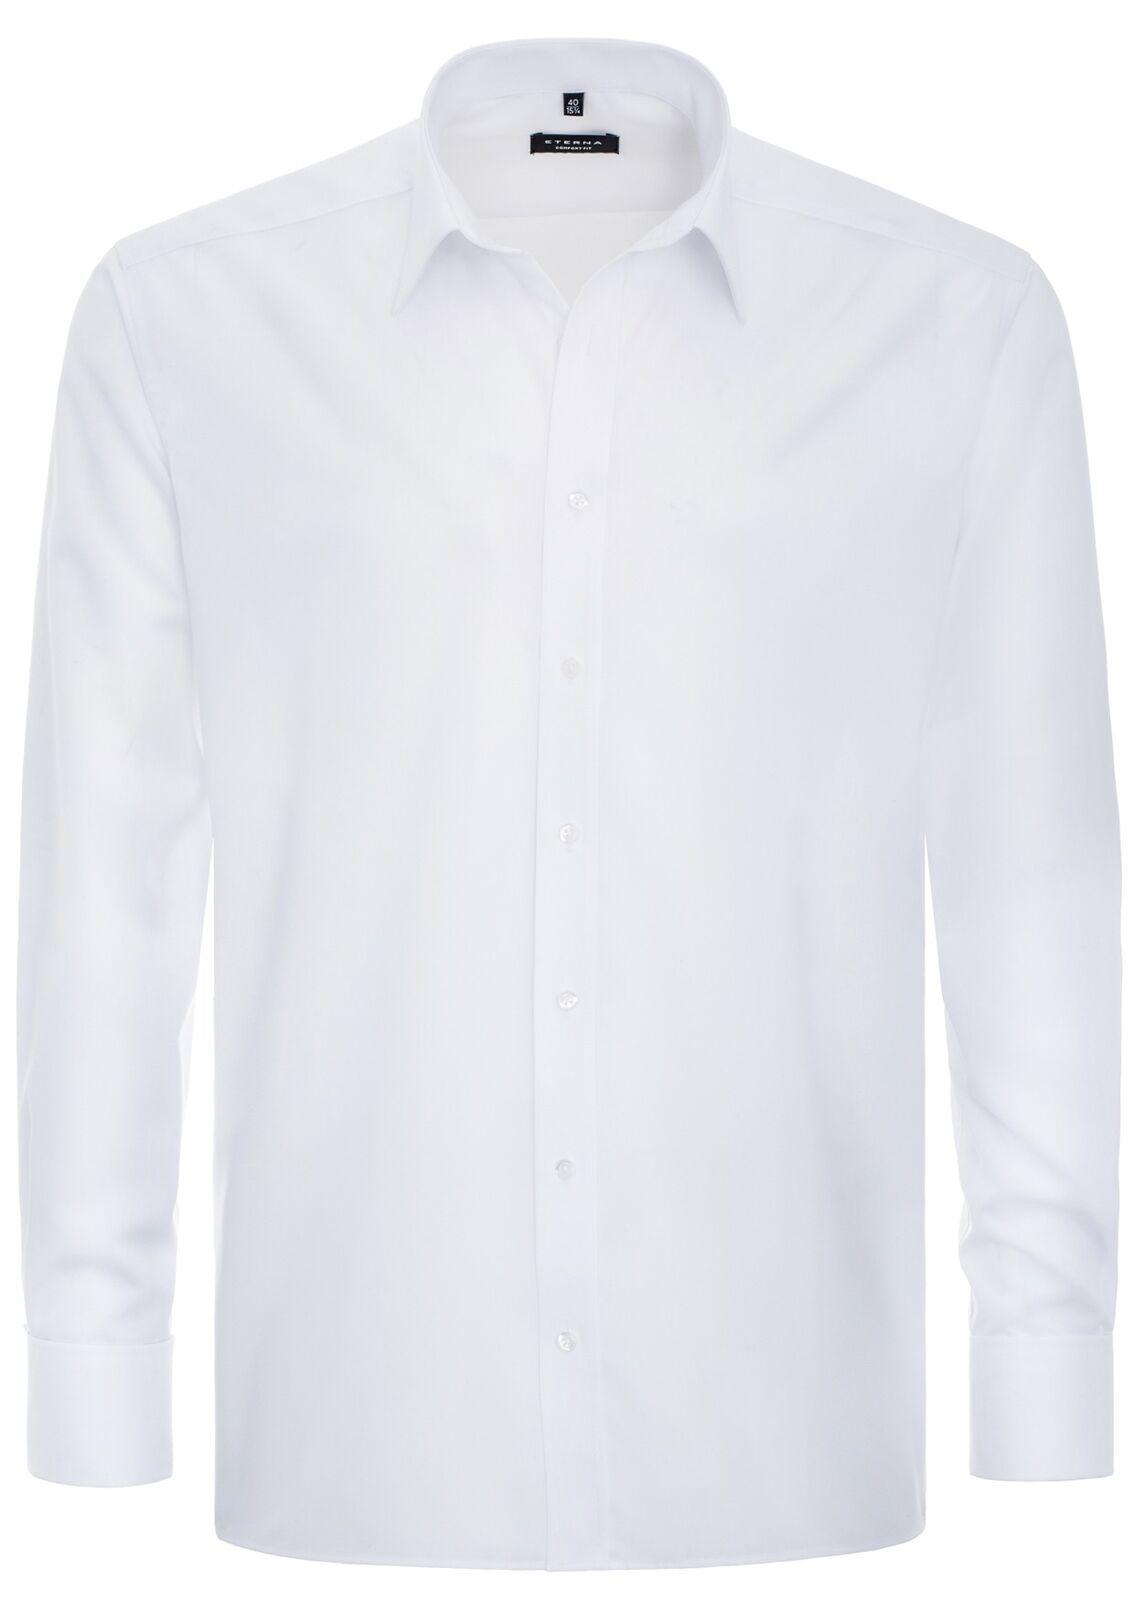 Eterna - Gala - Comfort Fit - Bügelfreies Herren Hemd mit Umschlagmanschette